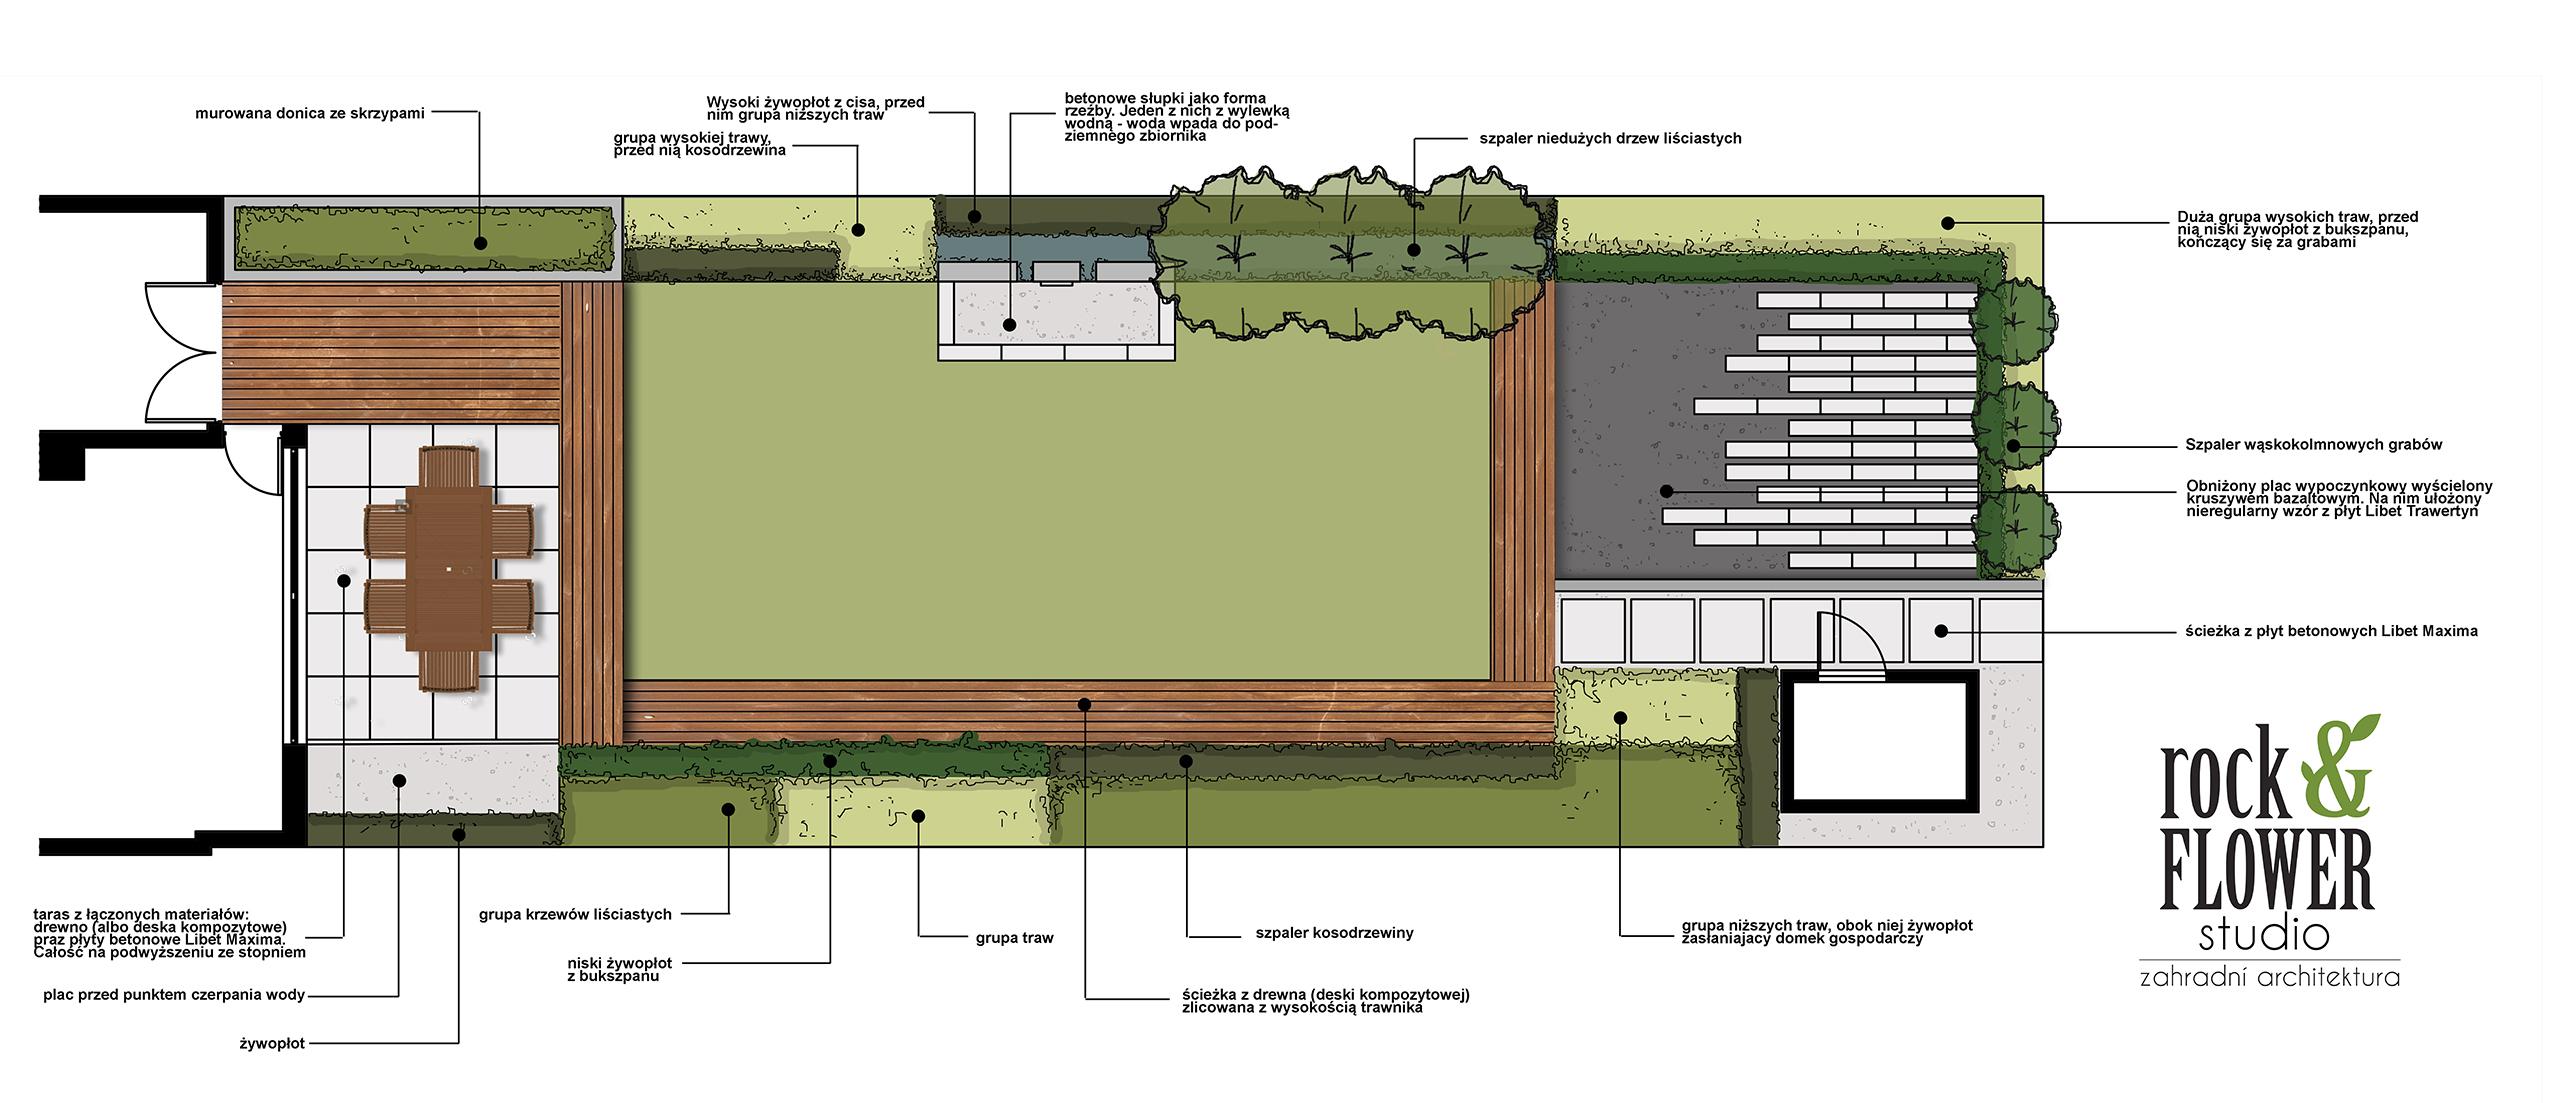 mala-zahrada-projekt-navhr-rock-and-flower-studio-praha-robert-k